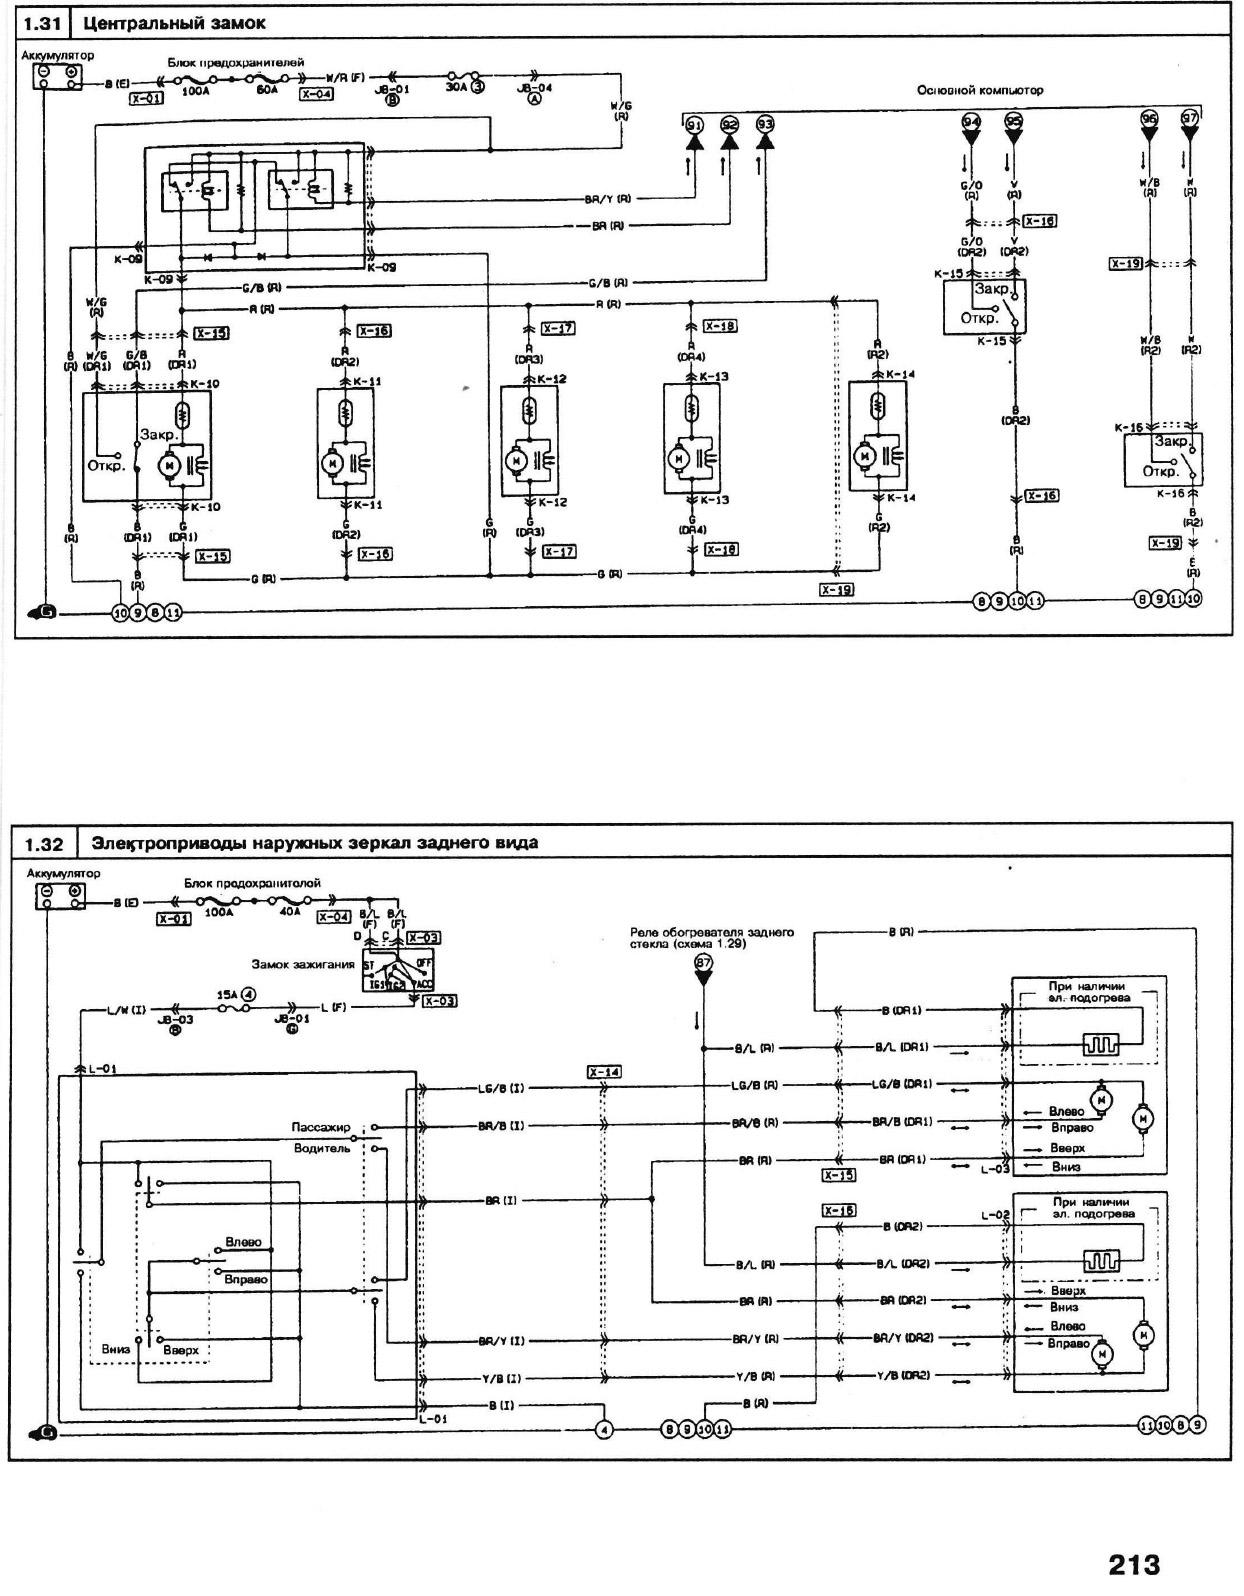 Мазда 626 схема двигателя фото 181